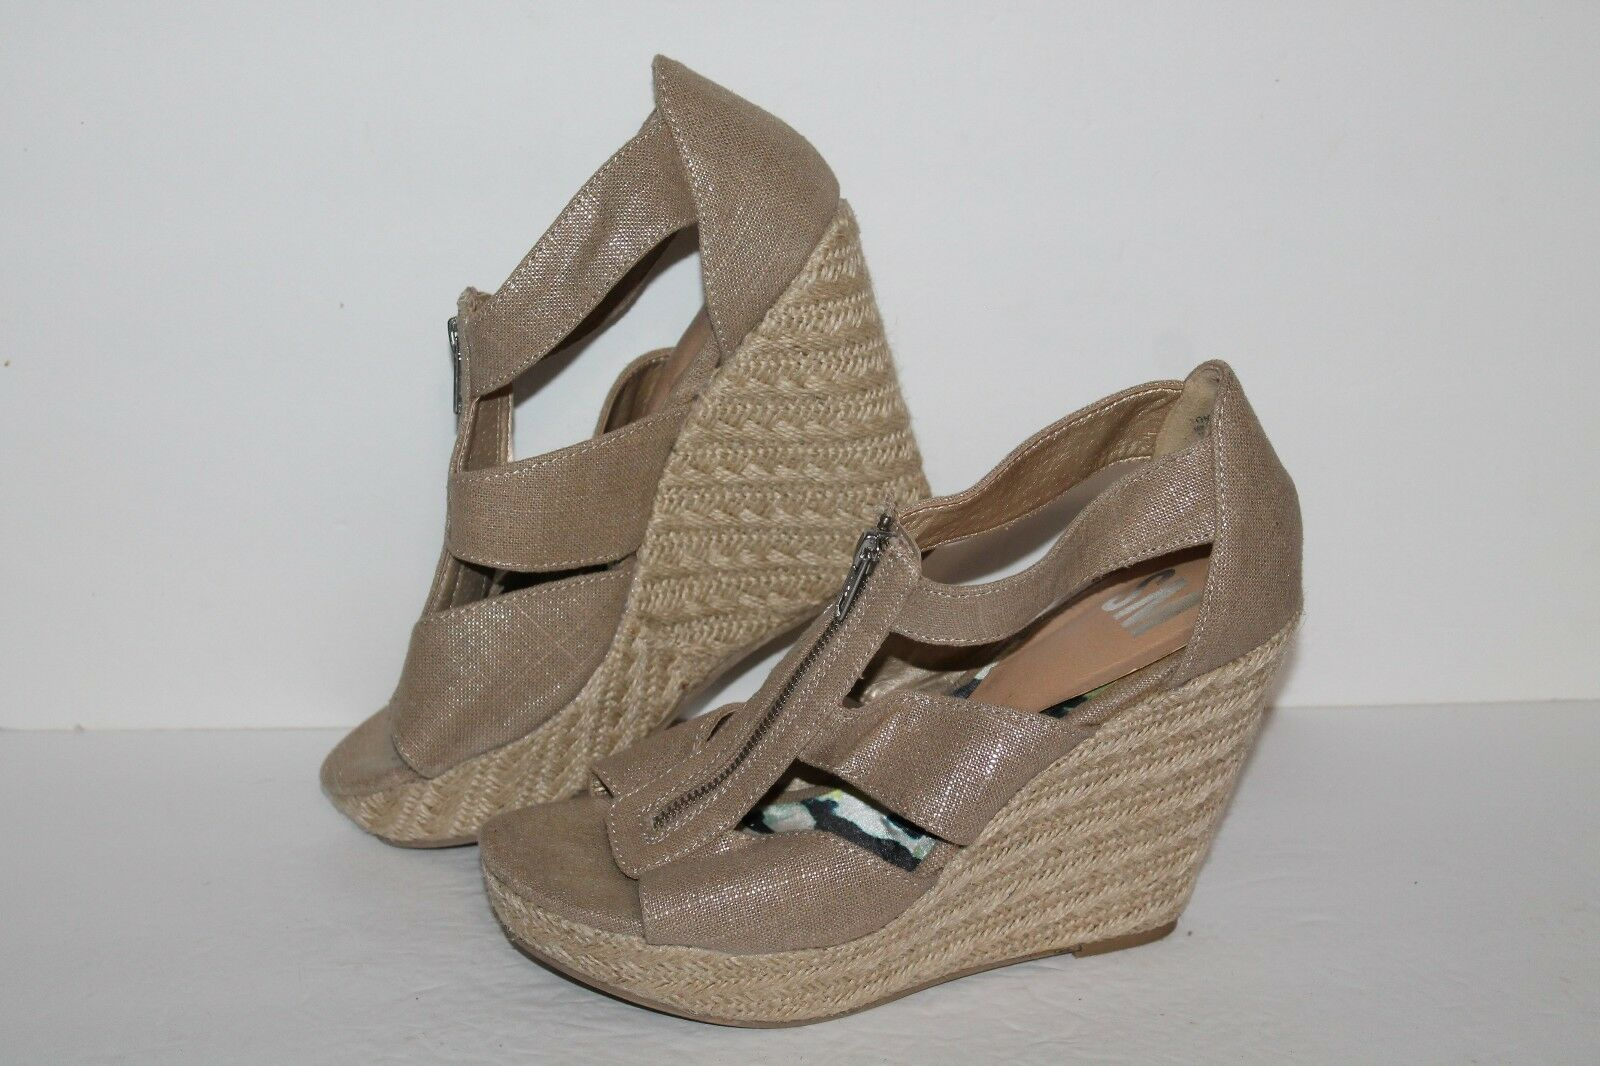 SM Wedge Sandals, Tan Metallic, 10  Women's US Size 10 Metallic, 3f8800